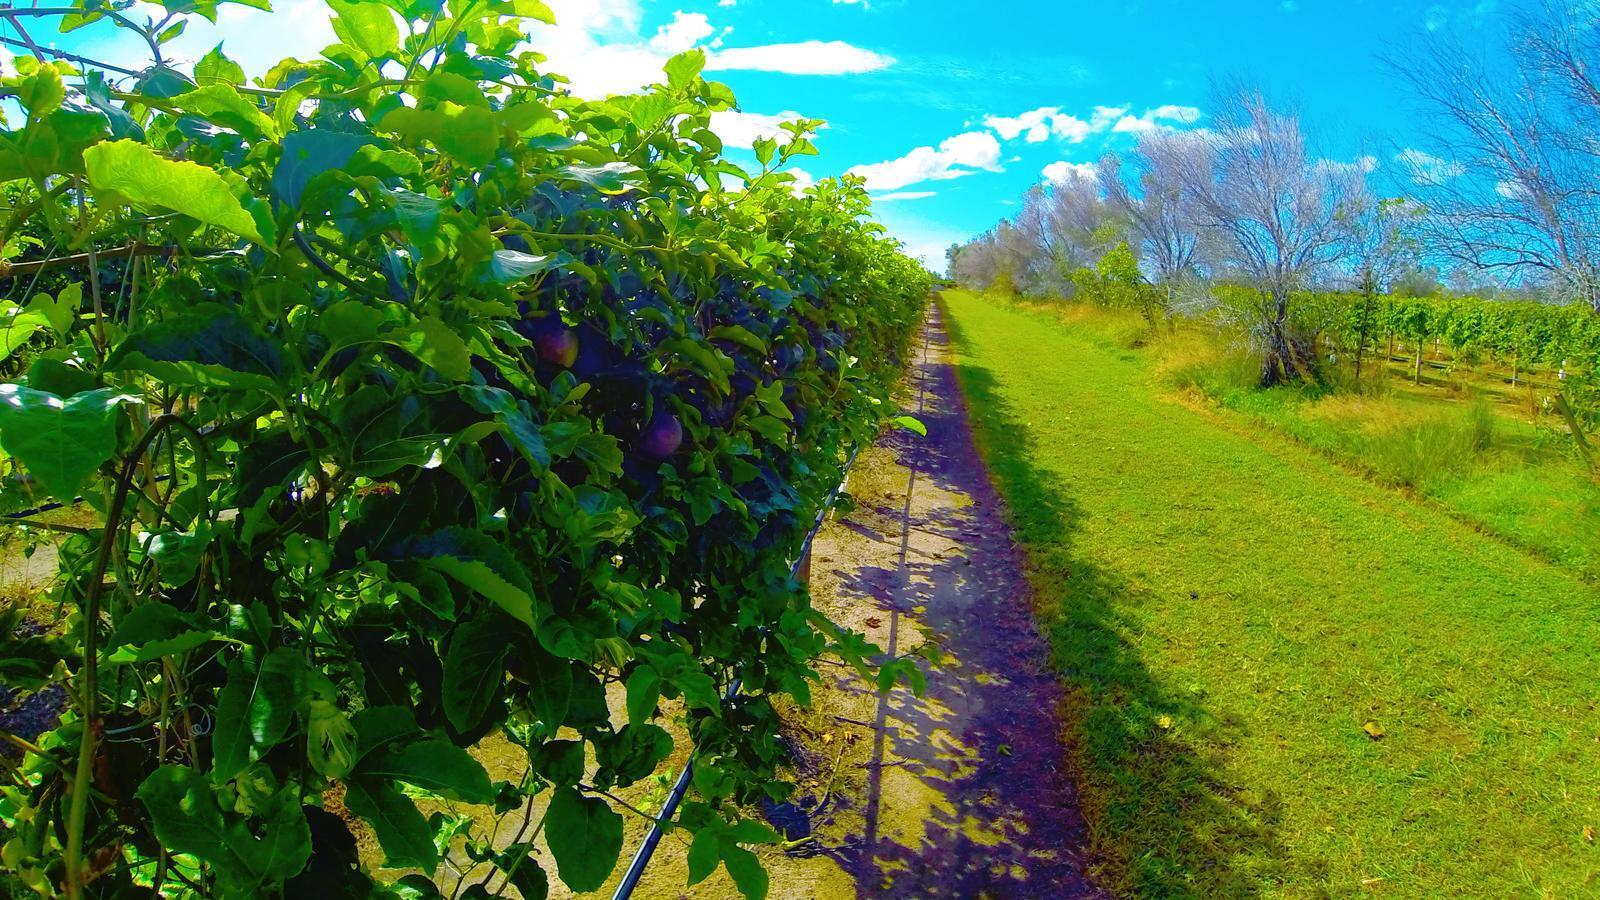 Passion fruit on vines.